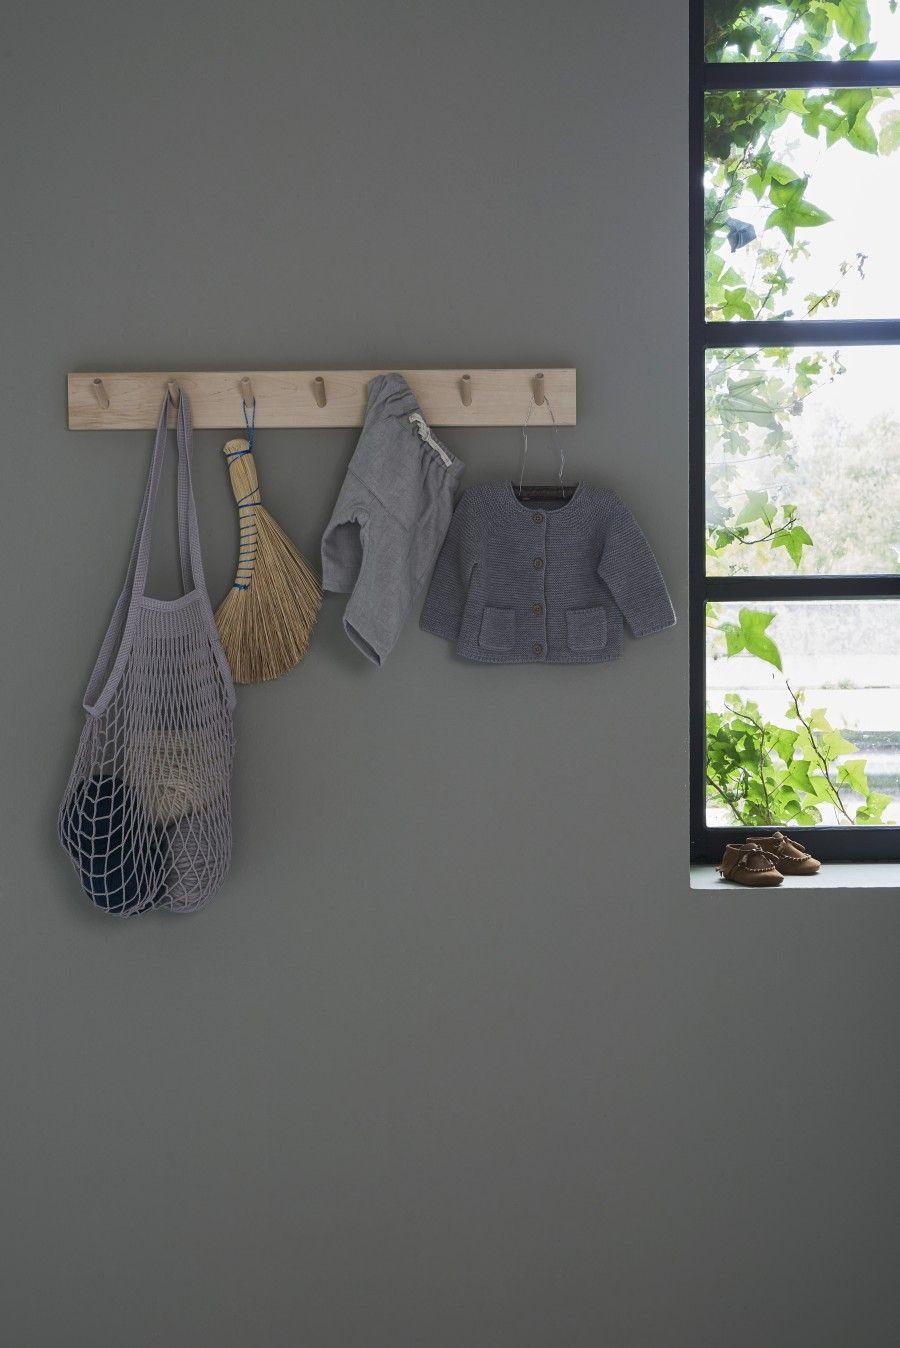 zara mini autumn \'17 | Pinterest | Wandfarbe und Architektur